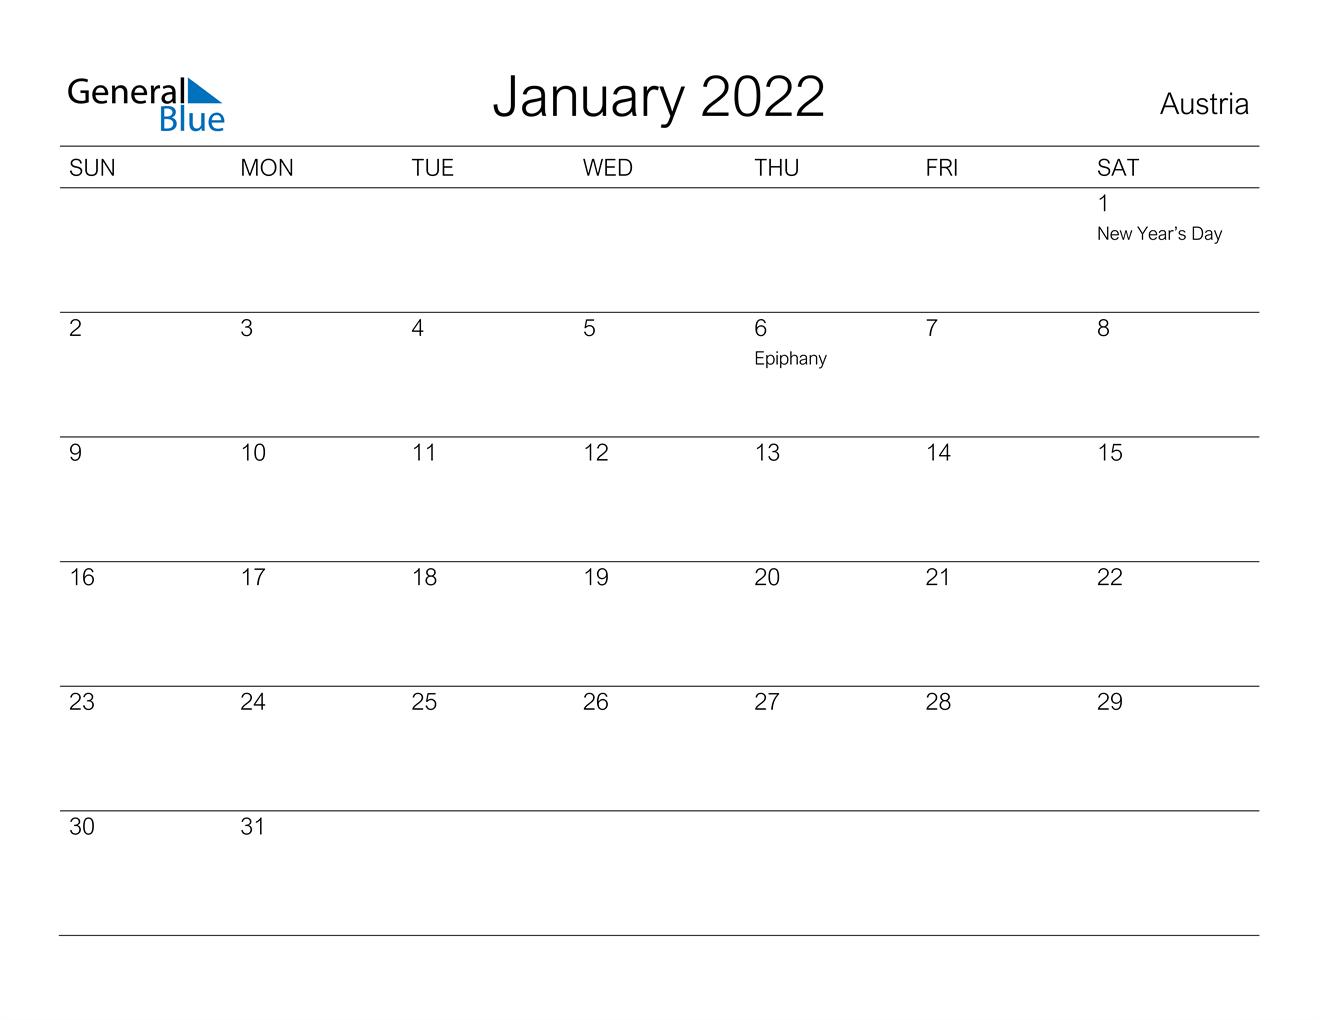 January 2022 Calendar - Austria